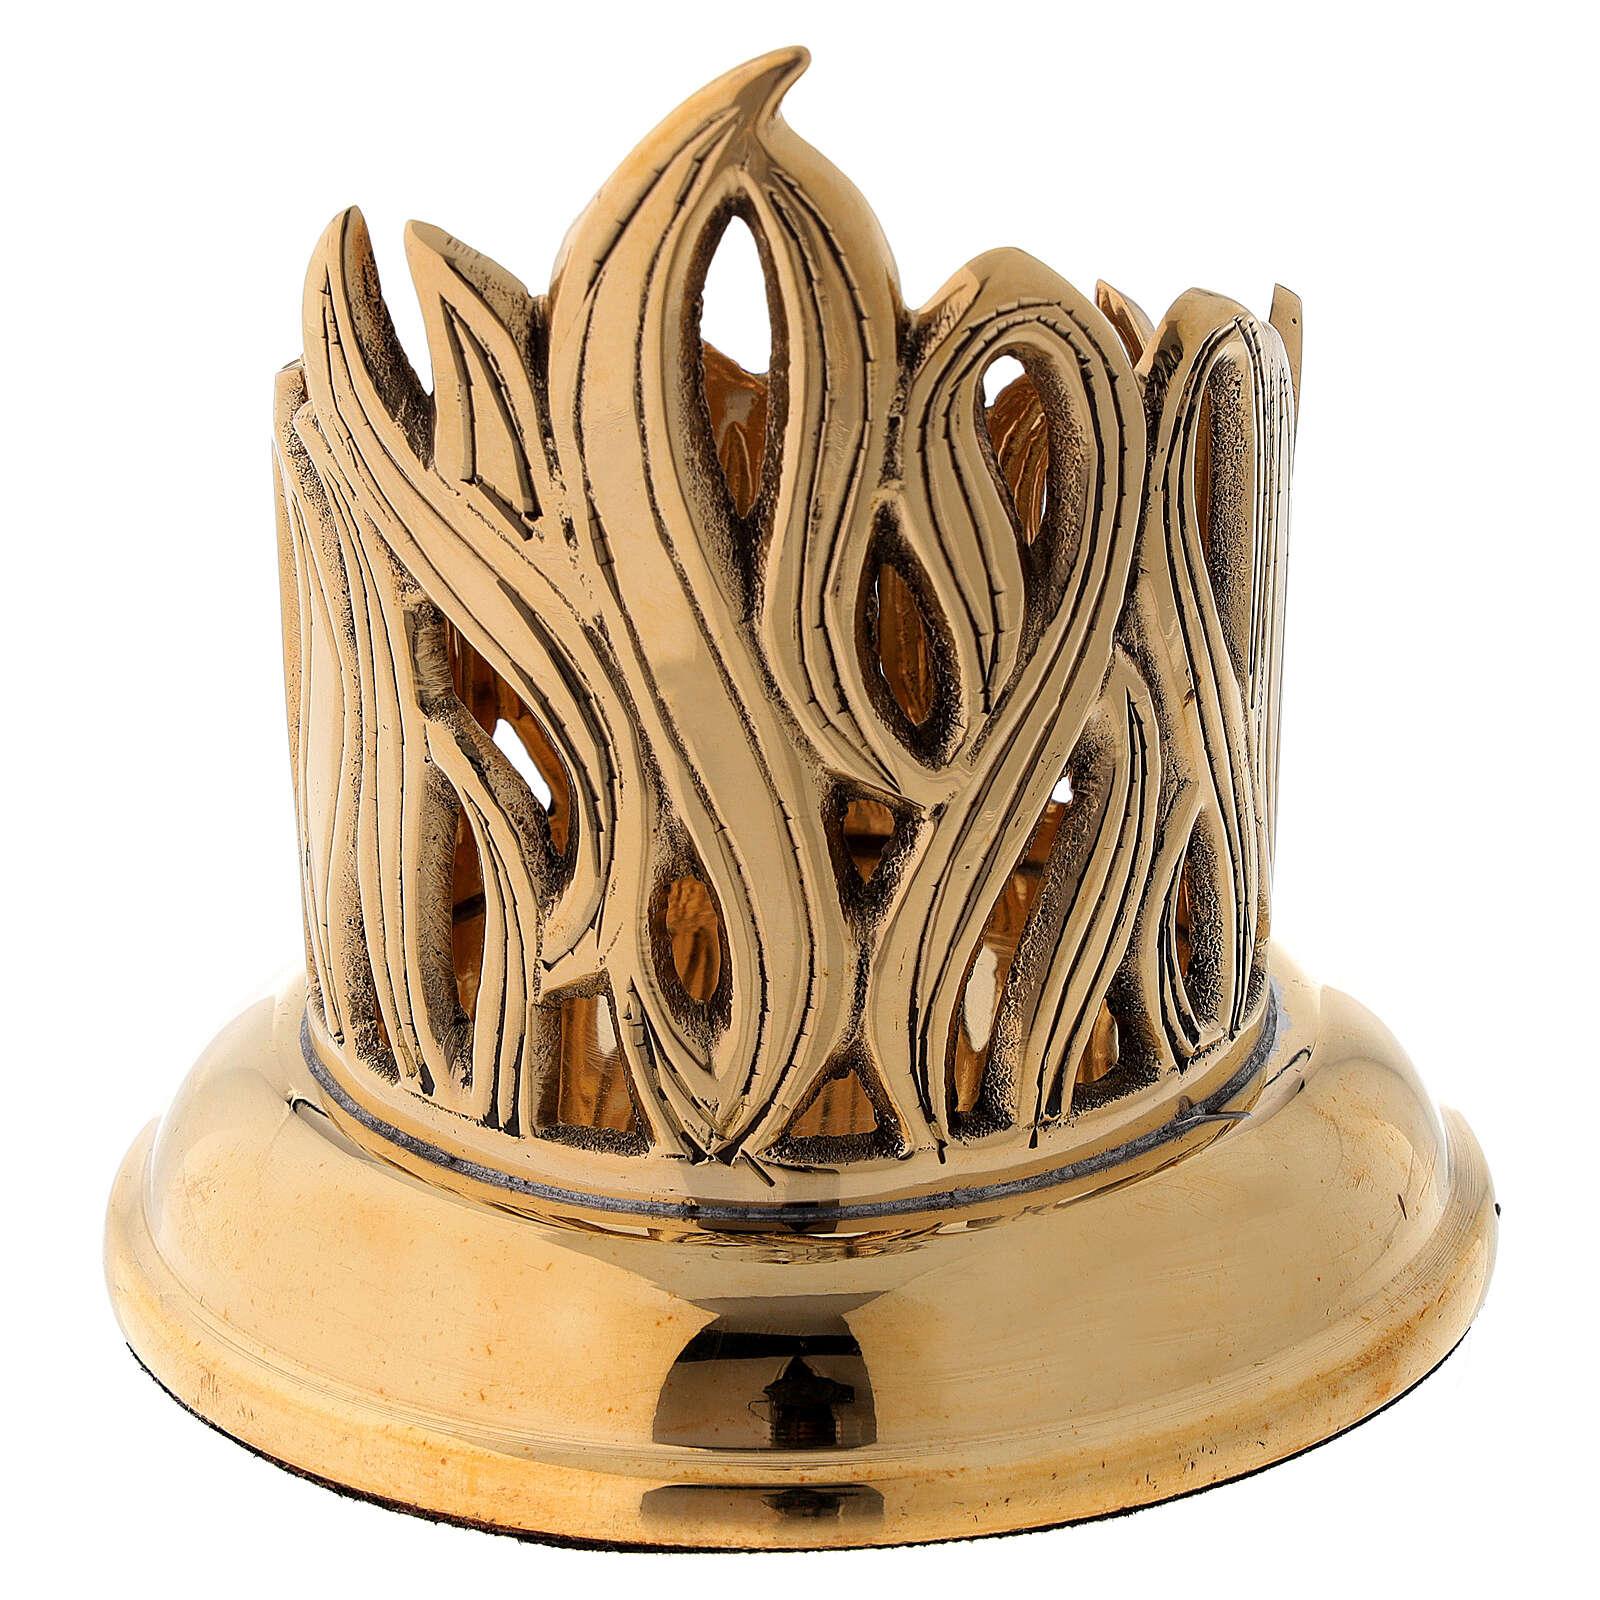 Portacandela disegno fiamme incise ottone dorato diam 6 cm 4